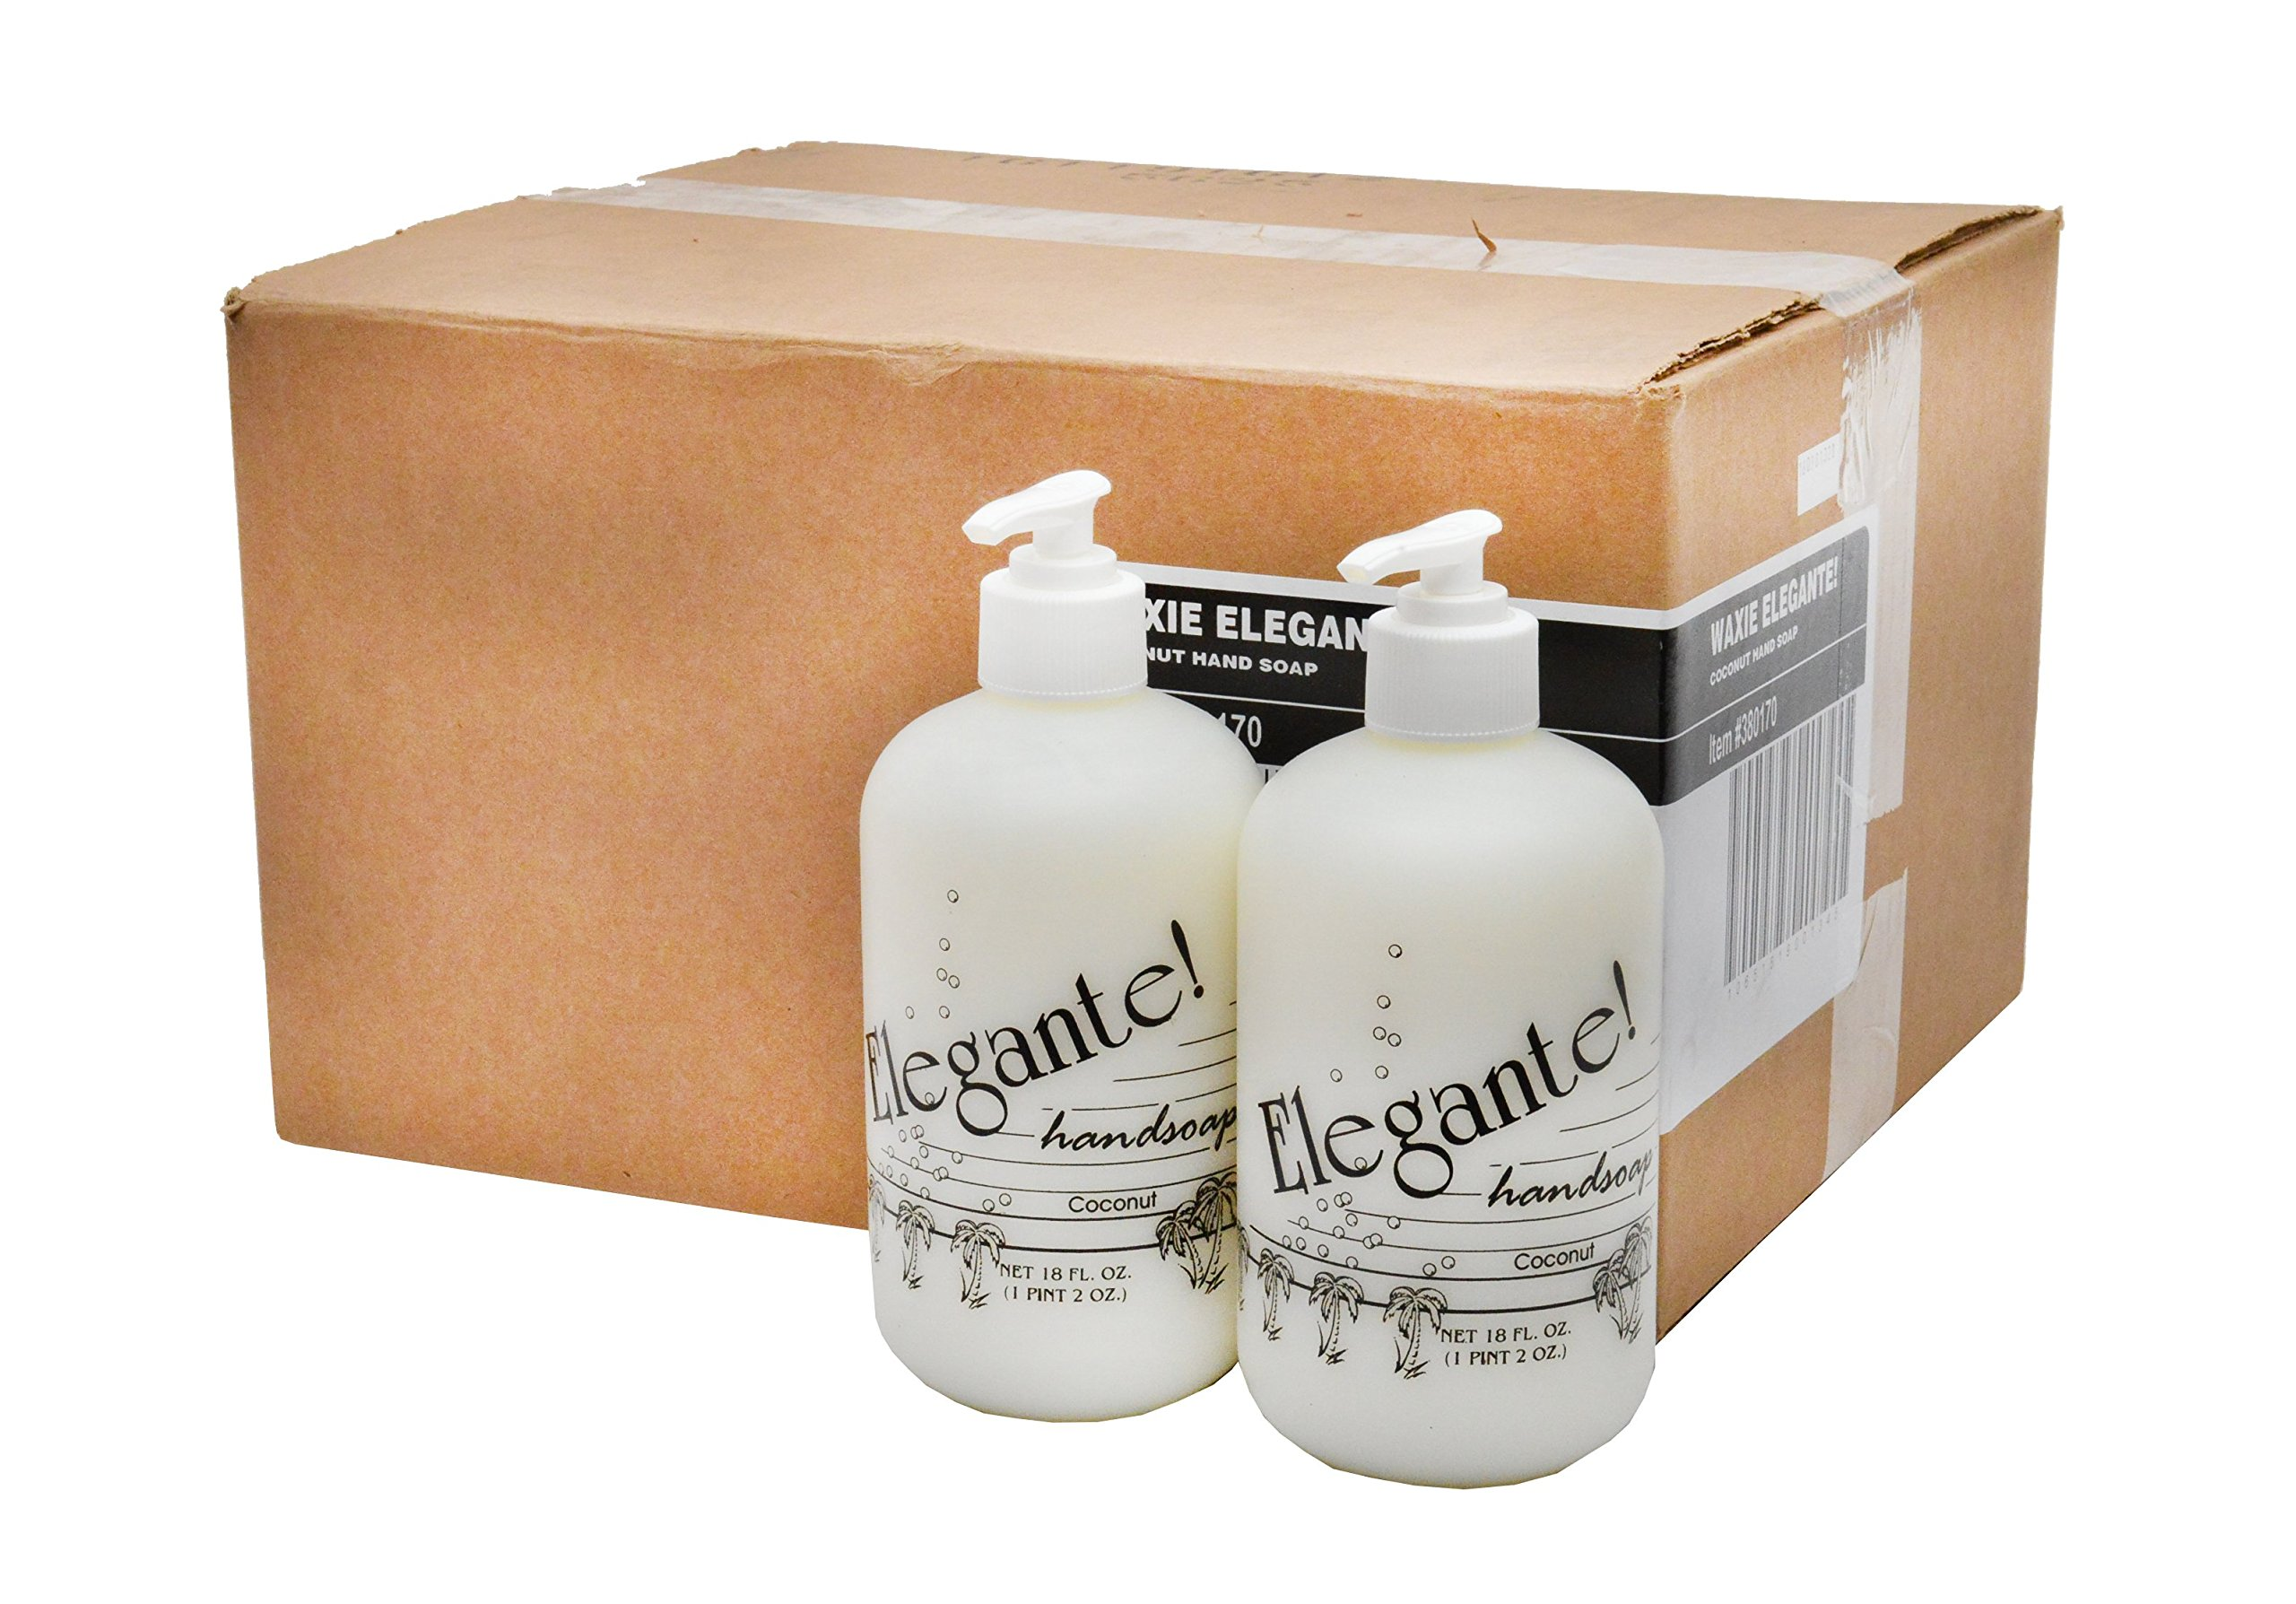 WAXIE Elegante! Liquid Hand Soap, Coconut Scent, 18 oz (Case of 12) by Waxie (Image #4)